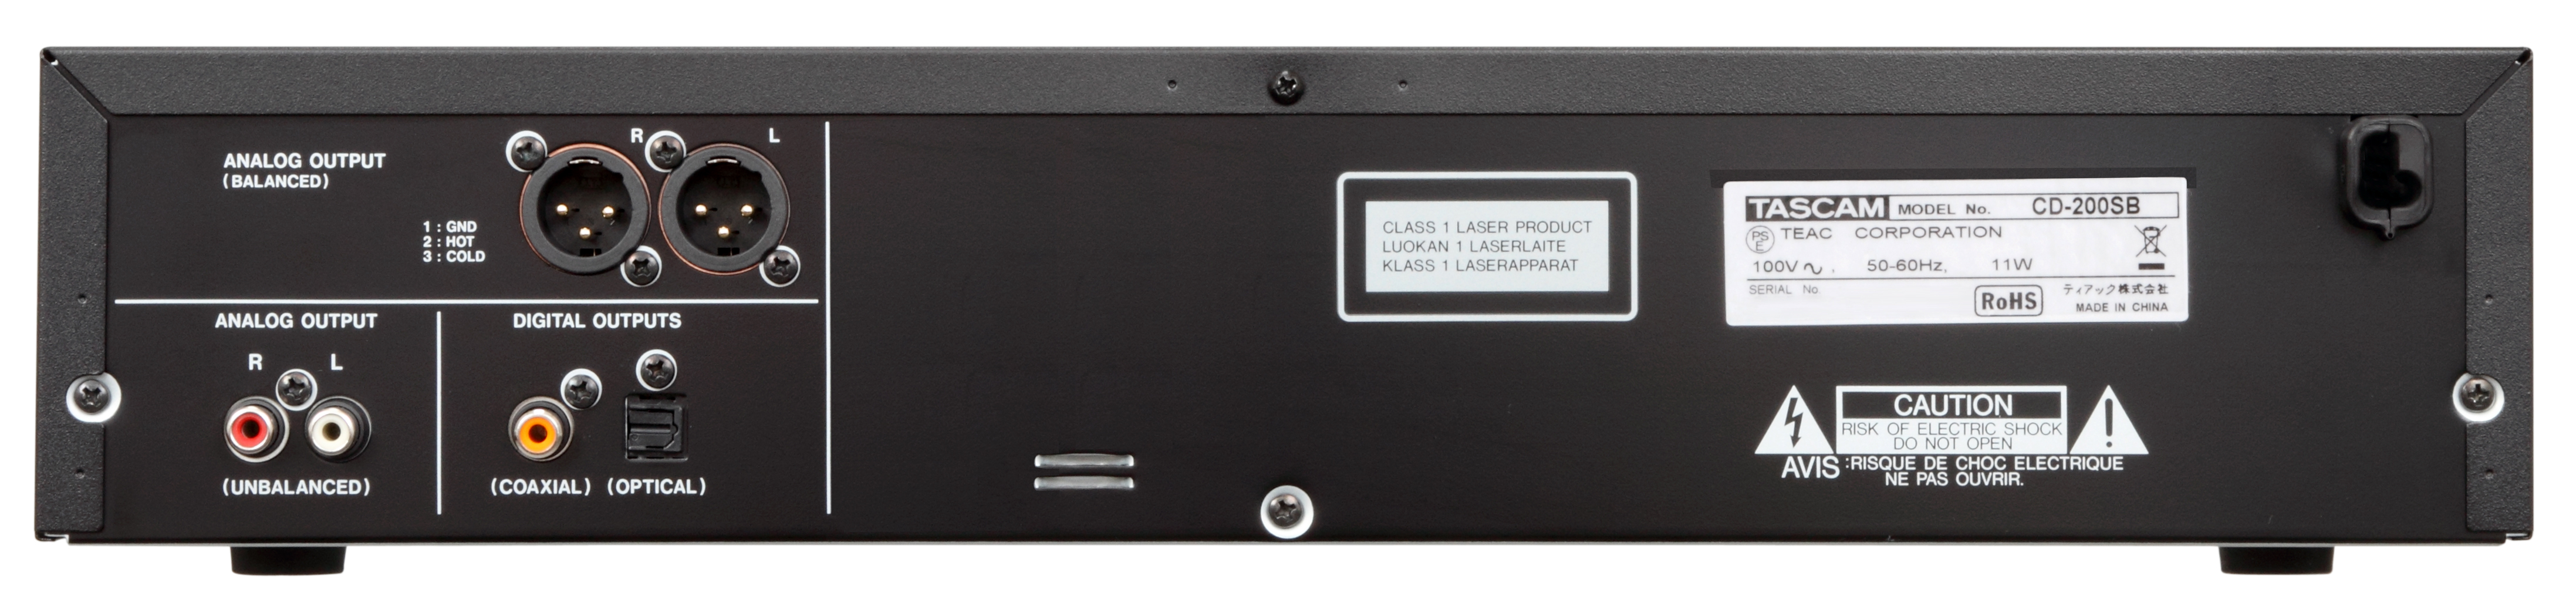 m audio microtrack 24 96 manual